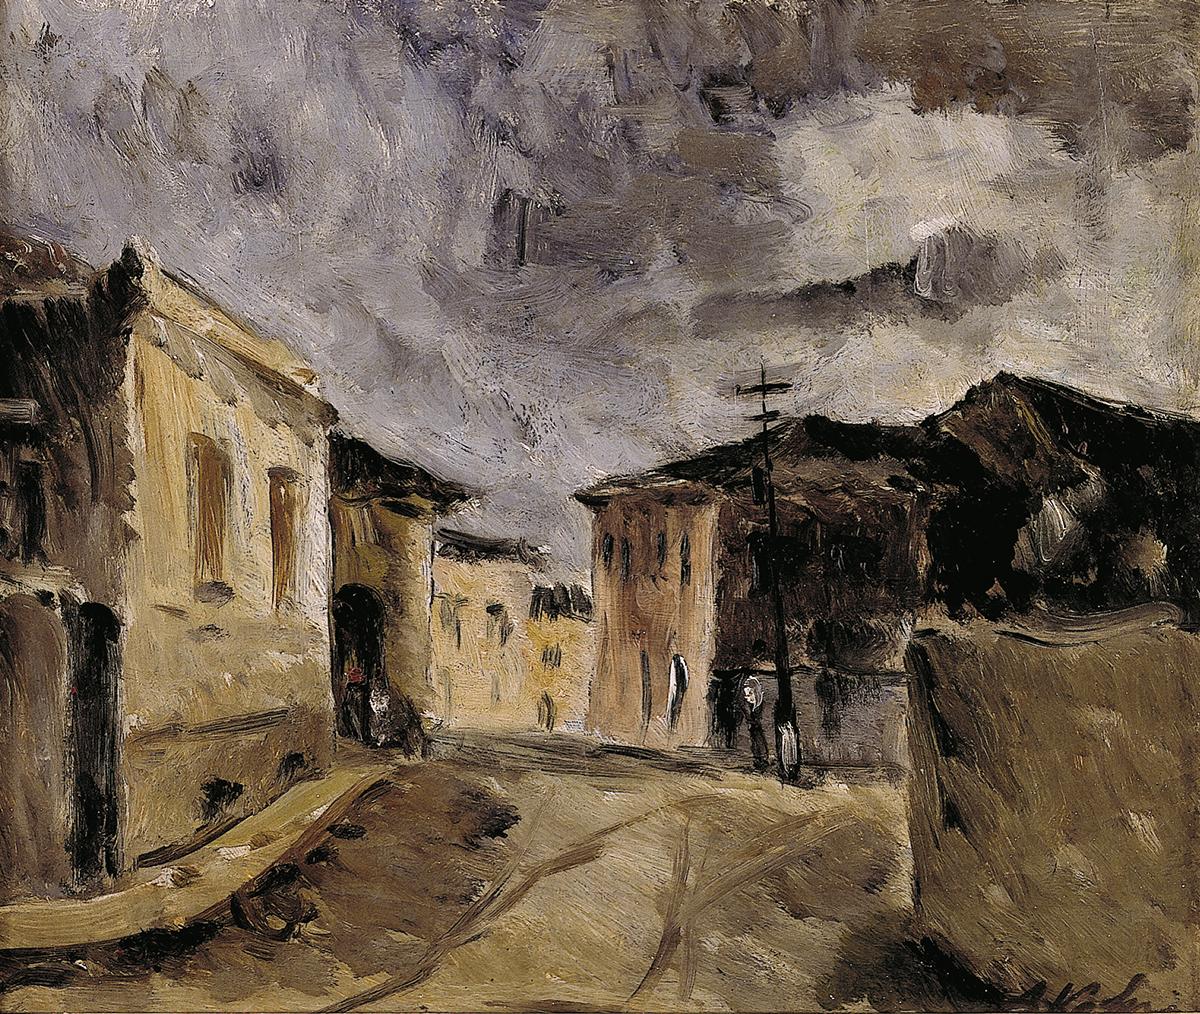 Mogi das Cruzes, 1932-1933, Alfredo Volpi